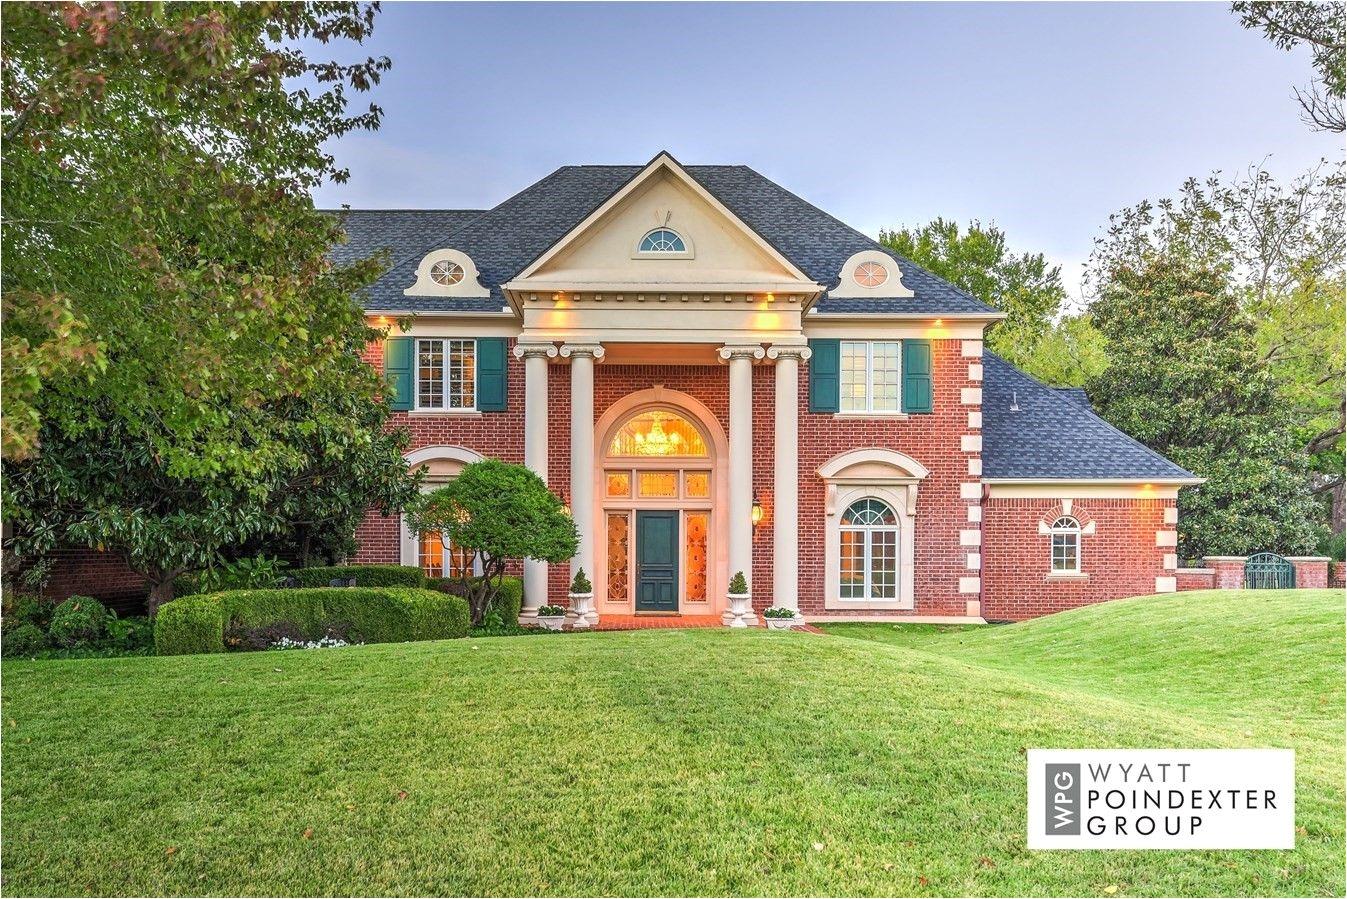 wyattpoindexter com keller williams realty elite in oklahoma city oklahoma luxury homes real estate edmond nichols hills